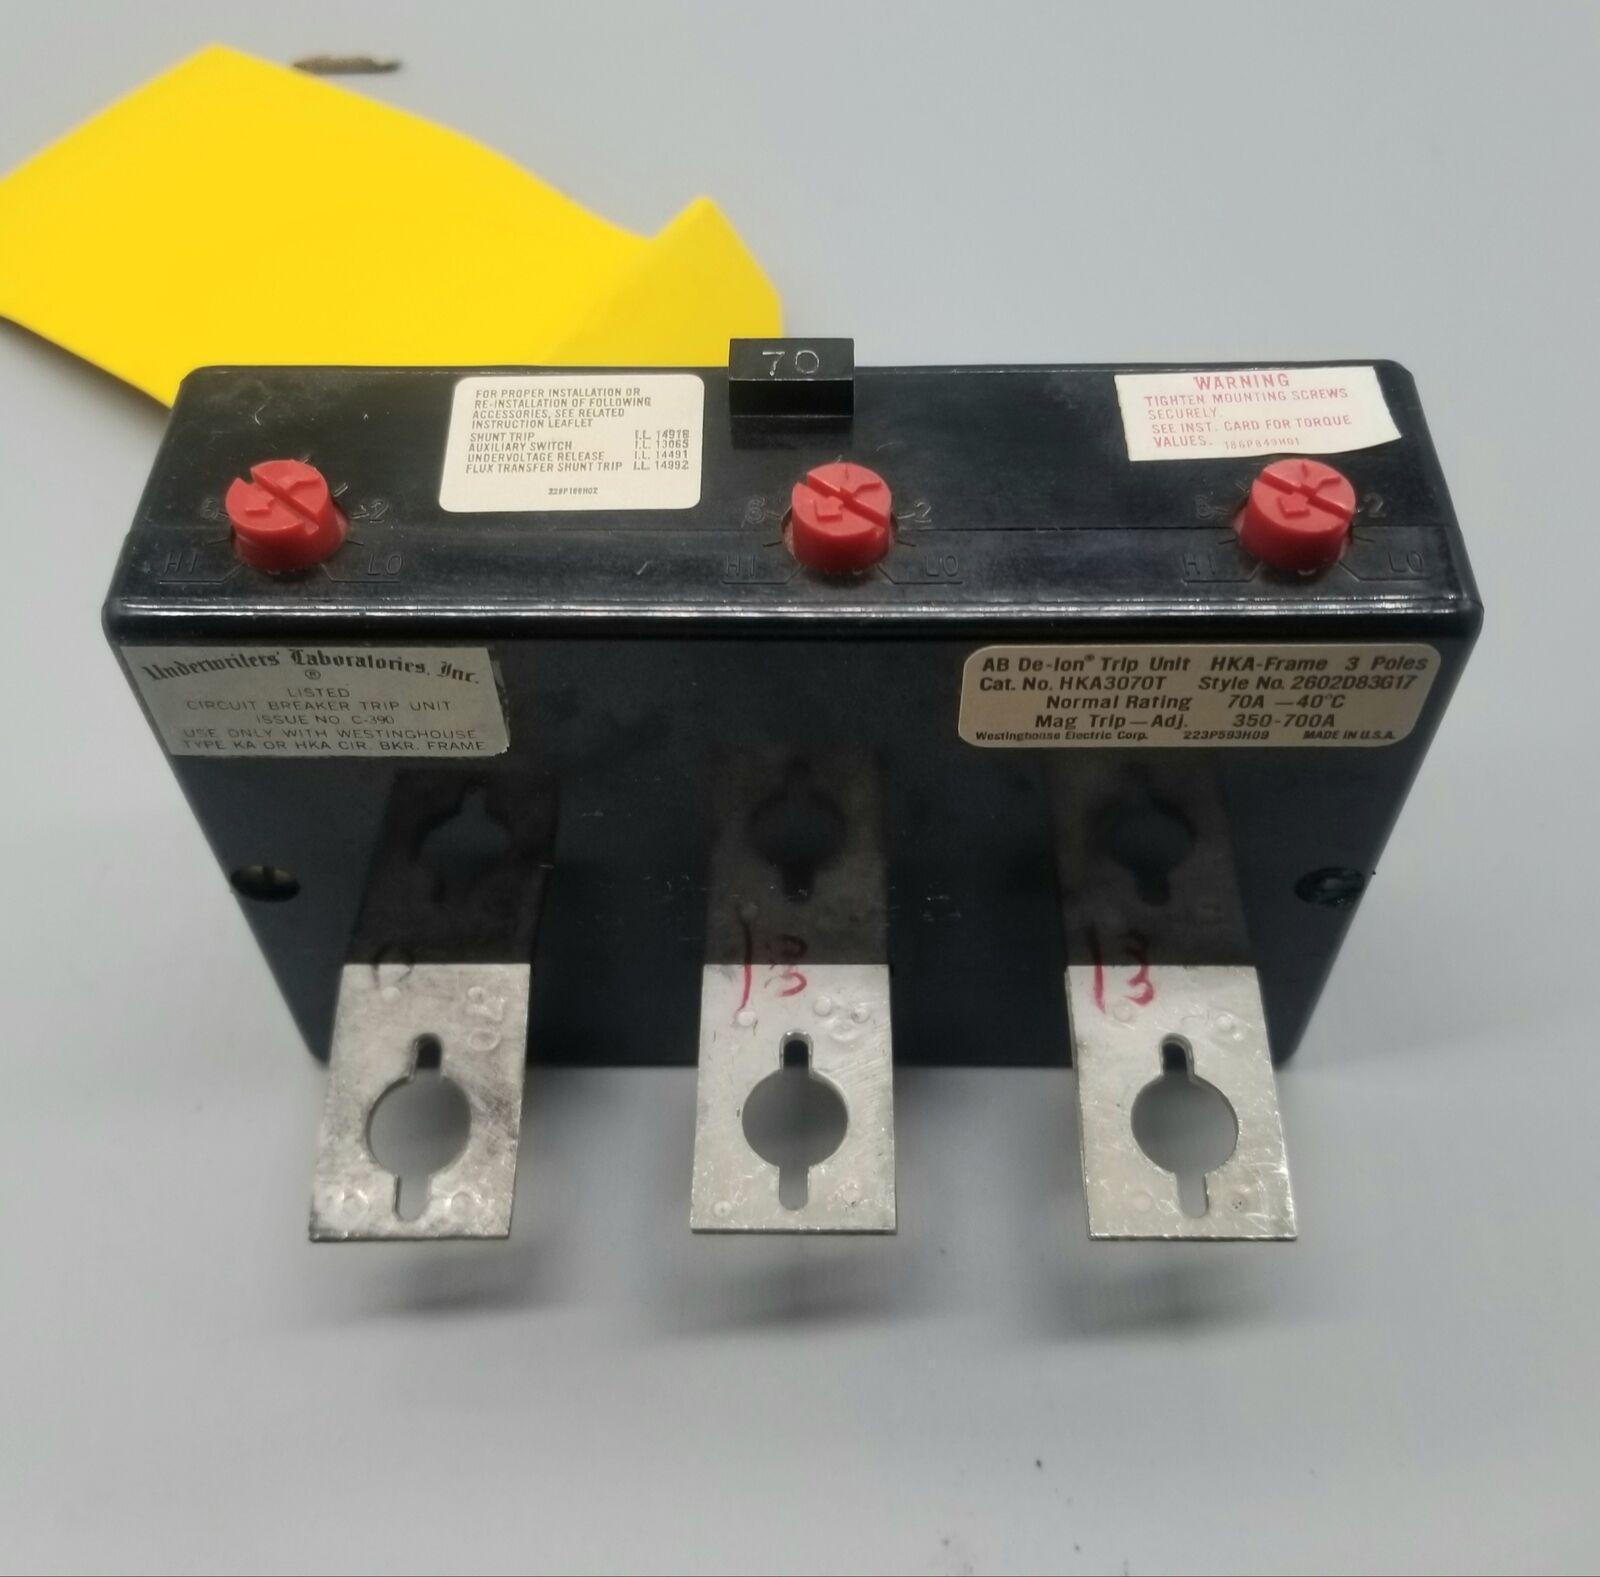 [NEW] Westinghouse HKA3070T Circuit Breaker Trip Unit, 70A